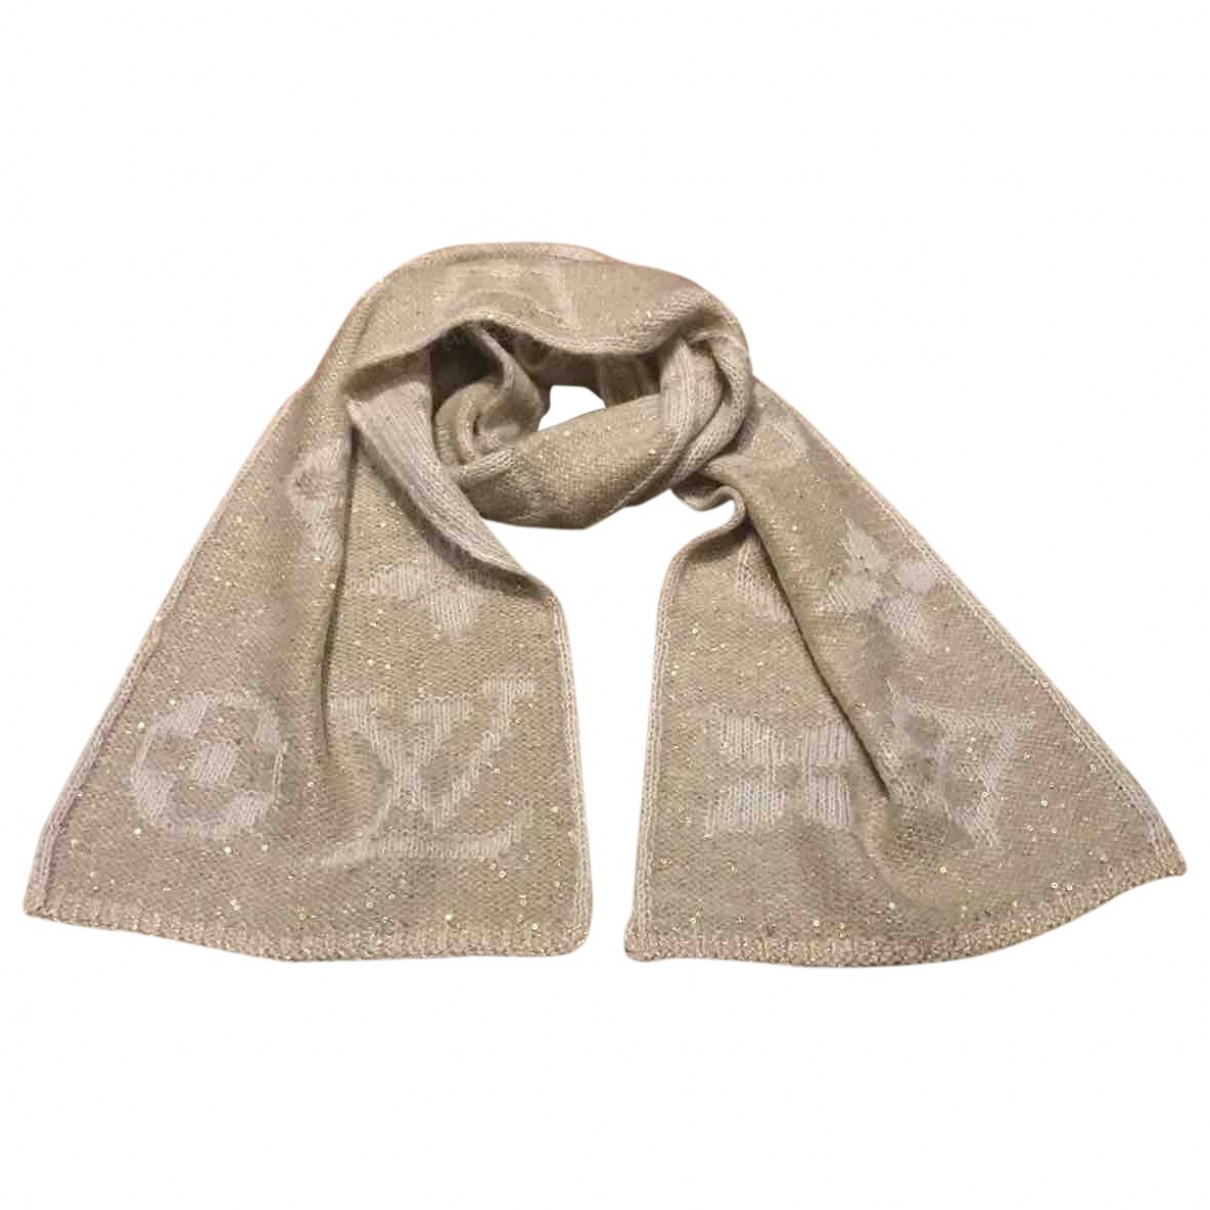 Louis Vuitton \N Beige Wool scarf for Women \N